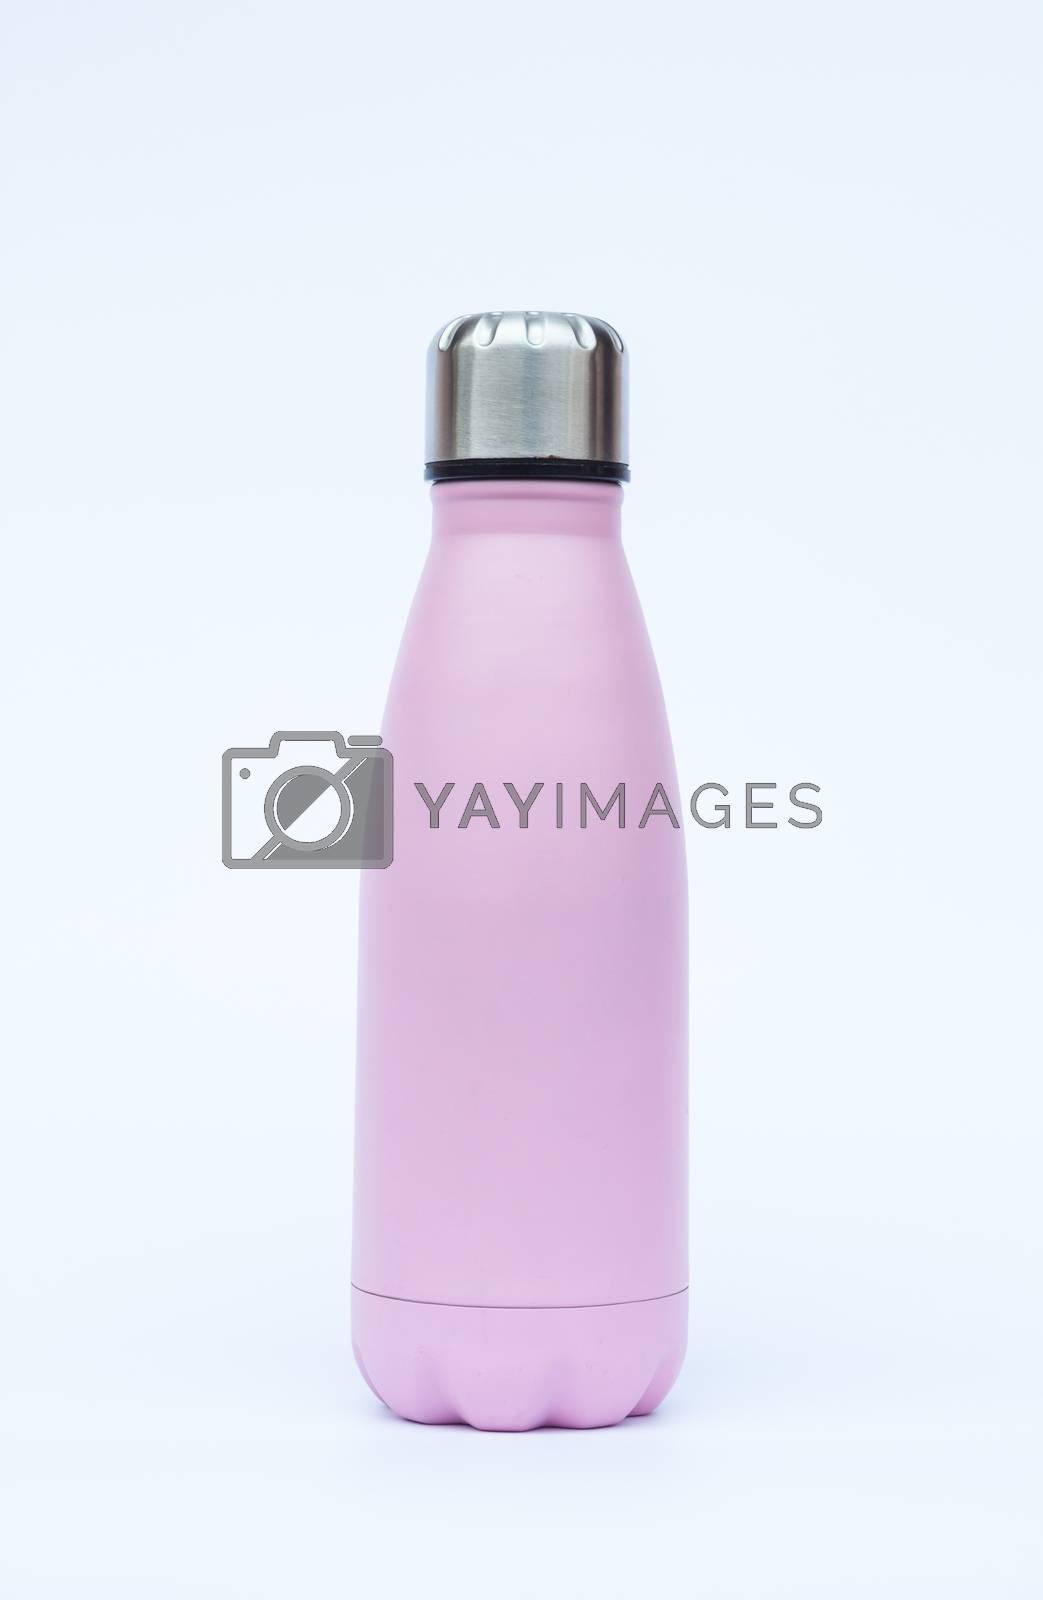 Warm bottle isolated on white background by punsayaporn